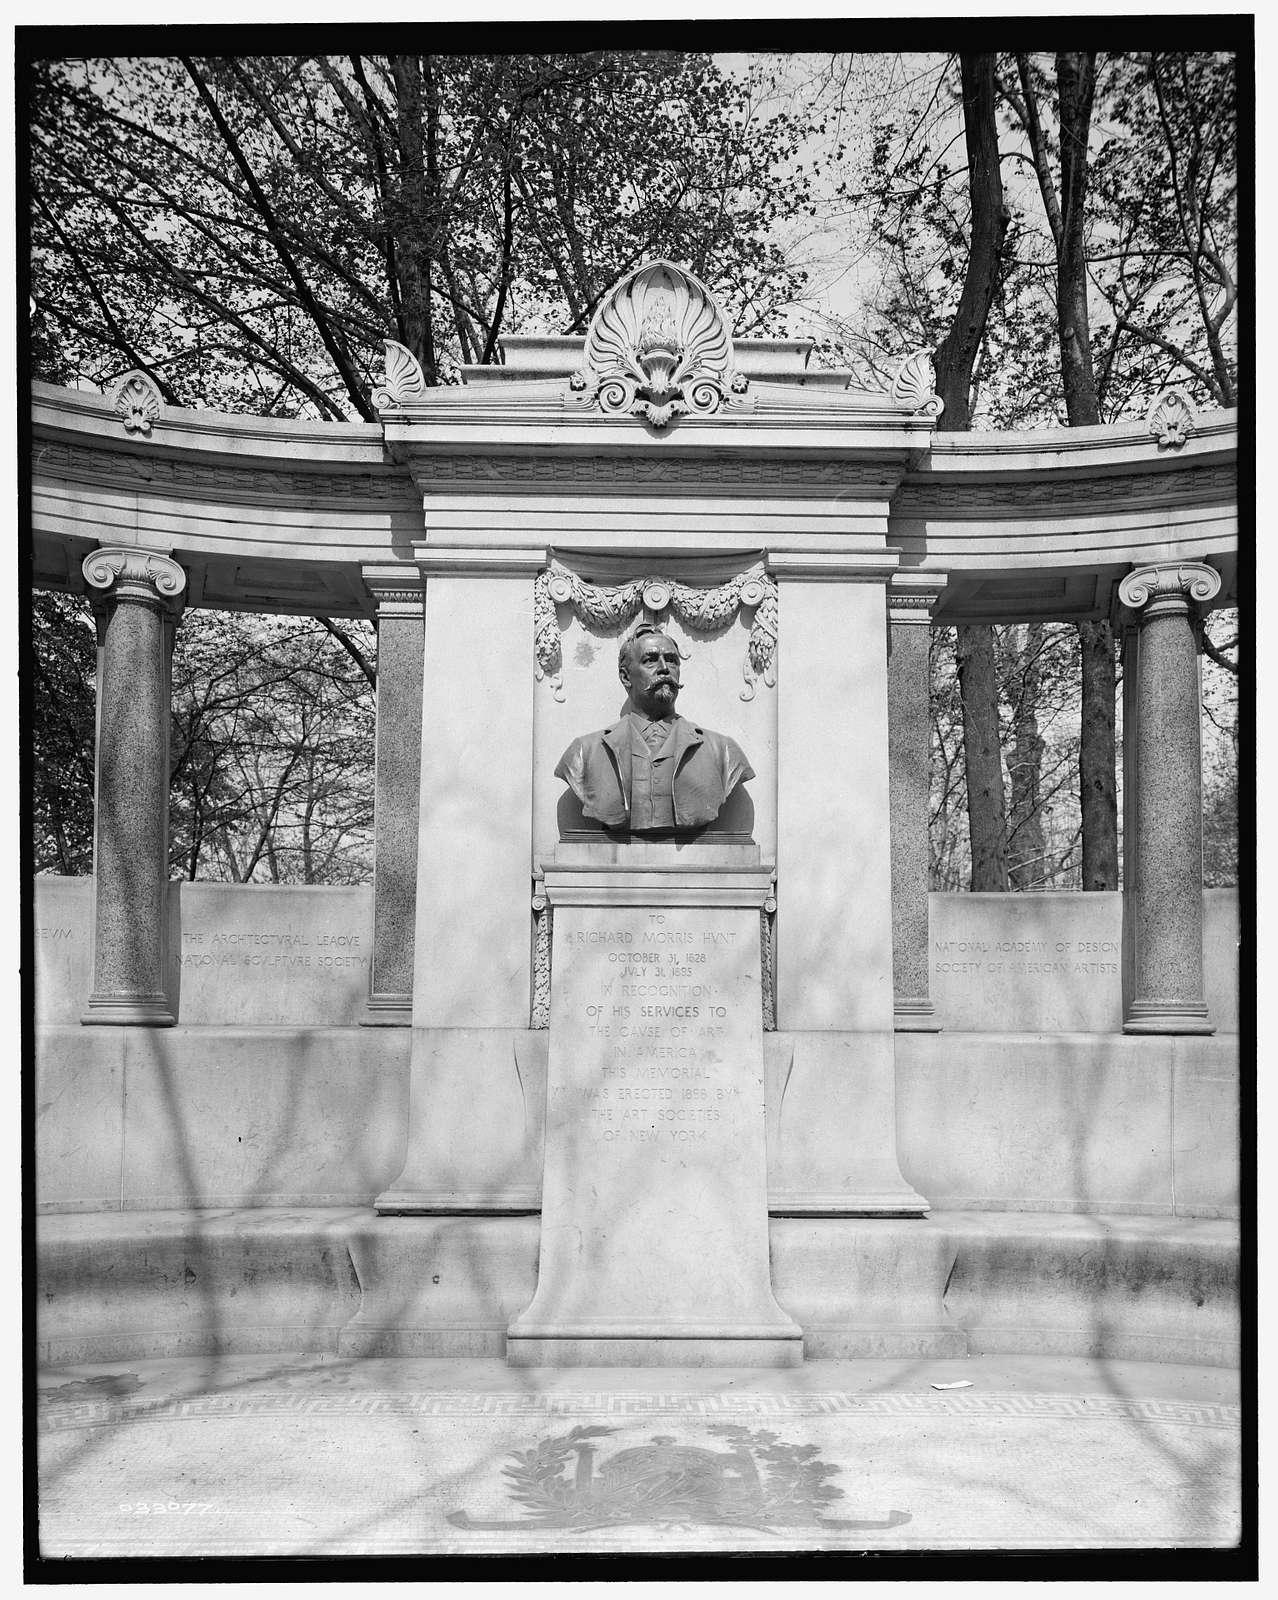 Richard Morris Hunt Monument, New York, N.Y.